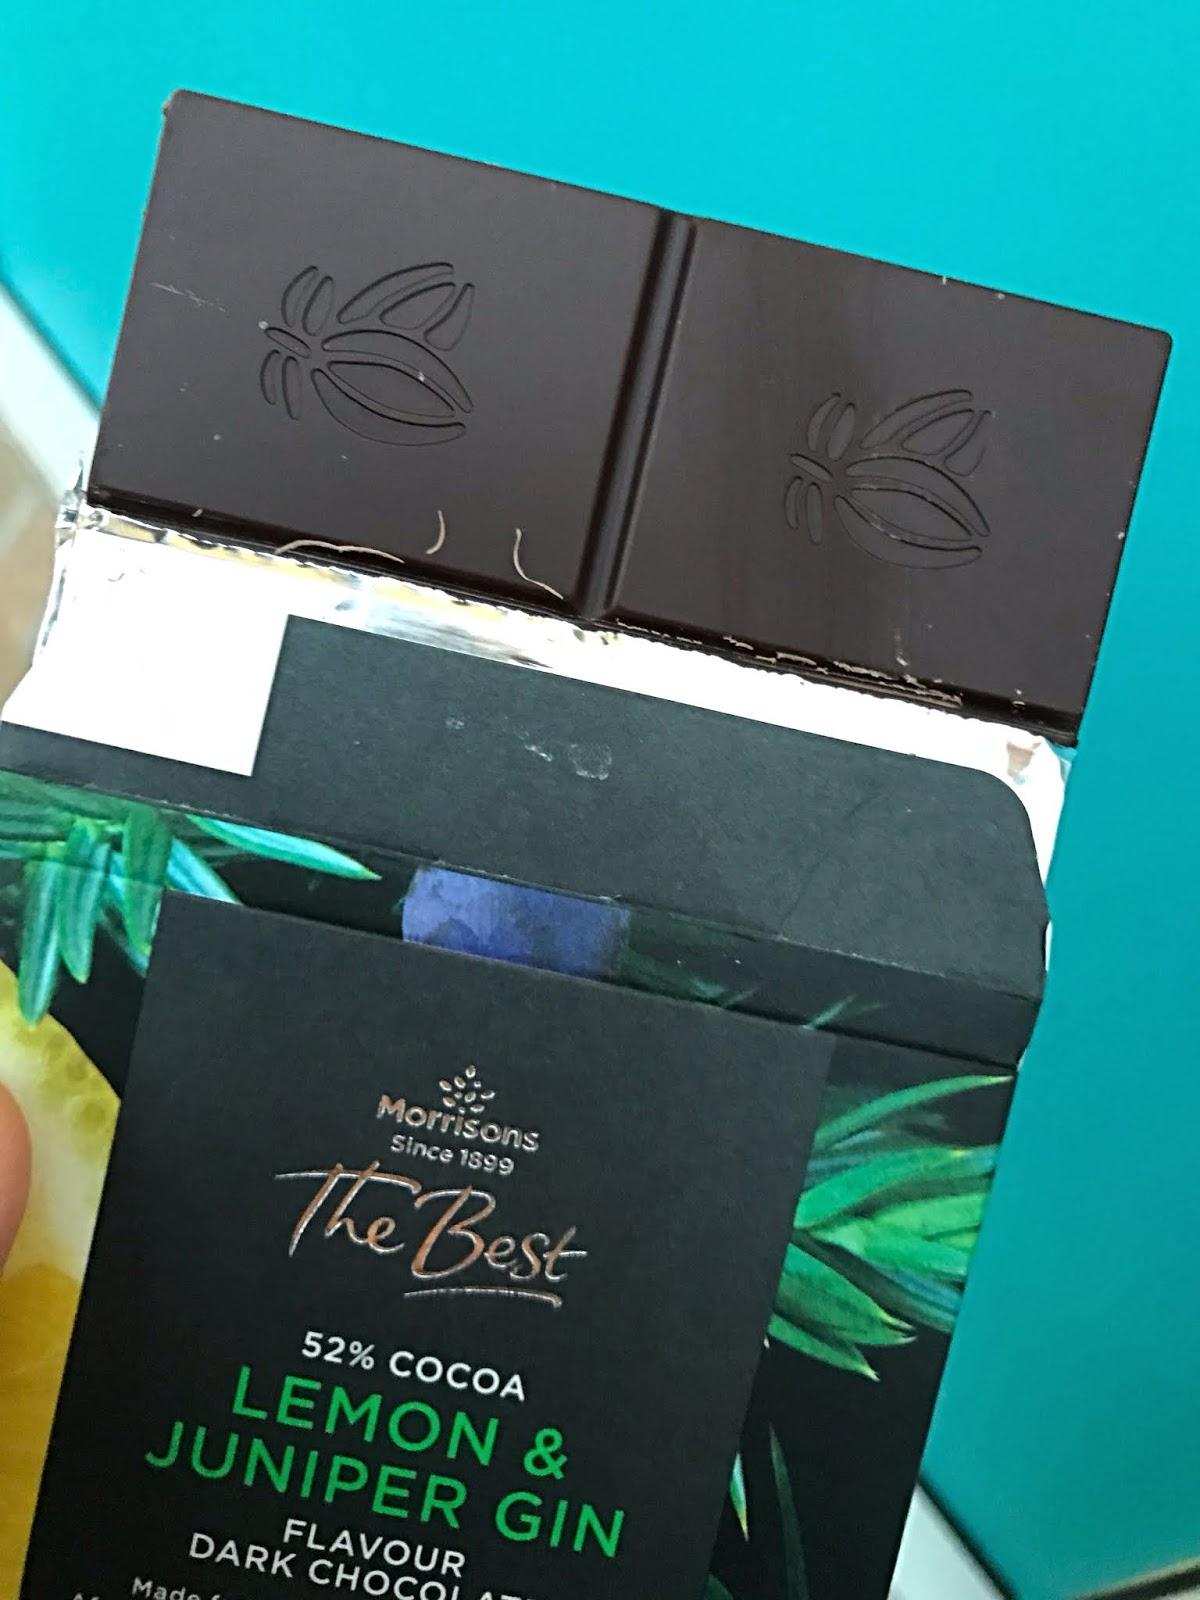 Morrisons The Best Lemon Juniper Gin Dark Chocolate